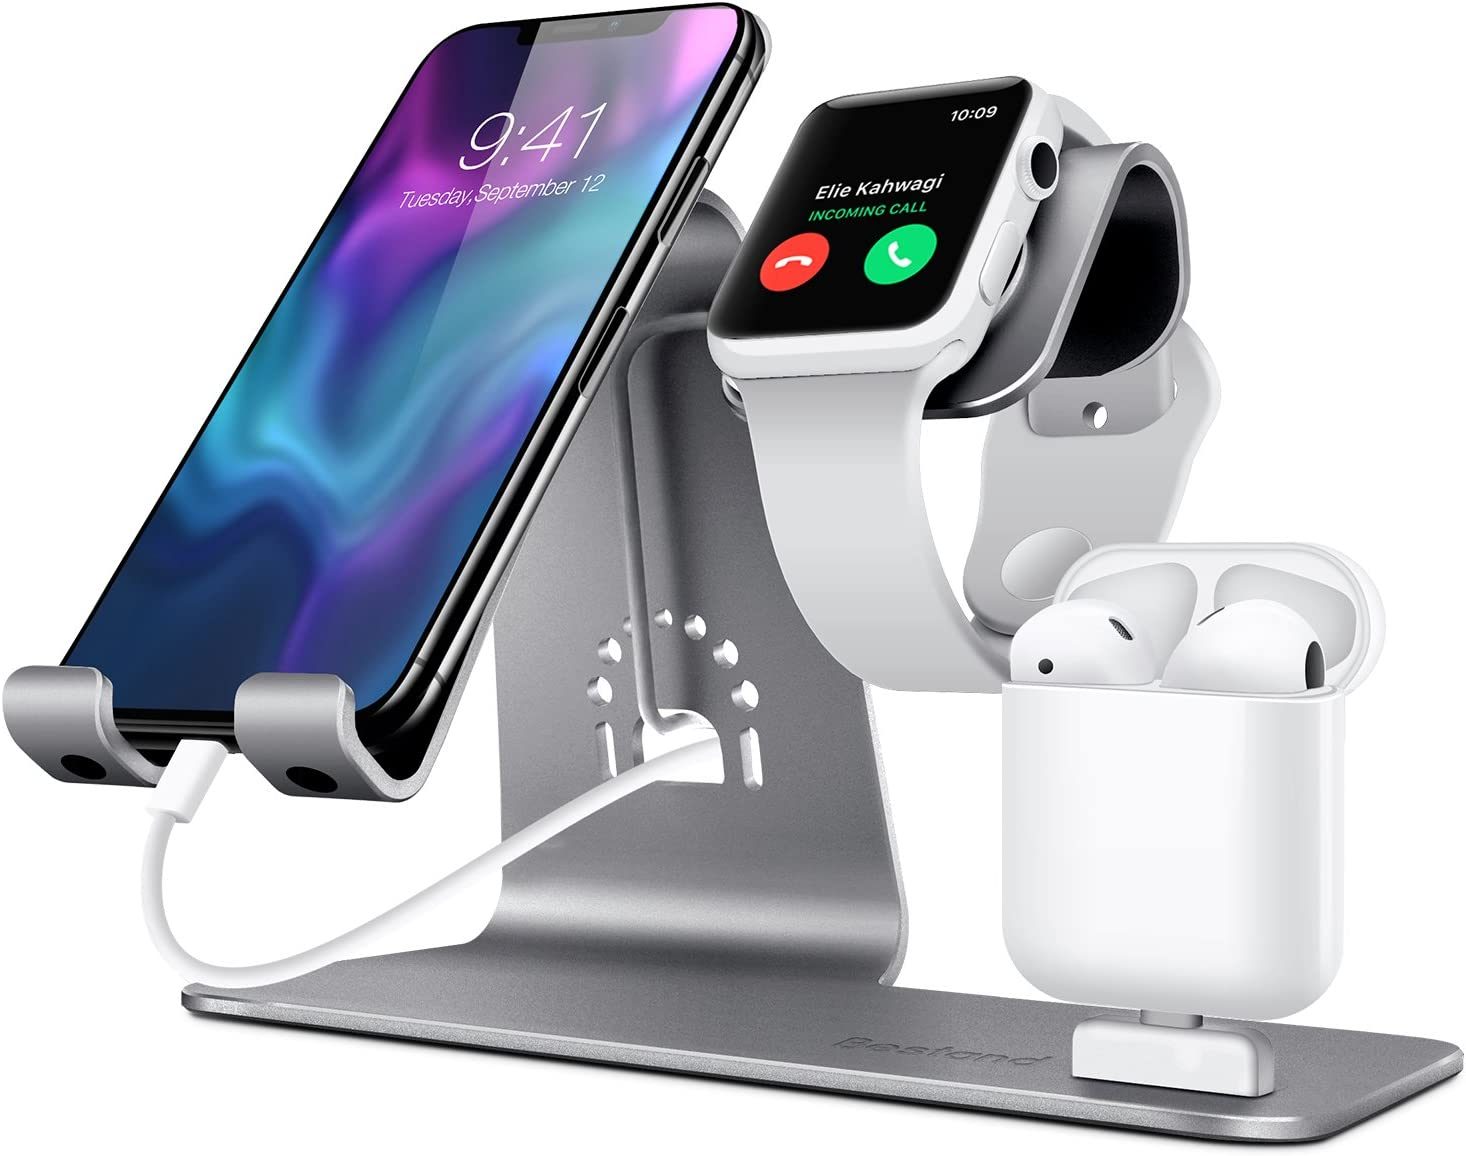 Bestand Soporte [3 en 1] Apple iWatch Estante para, Punto cargador para Airpods, Apple Watch para iPhoneX/8Plus/8/ 7/ 6s Plus, iPad en Gris